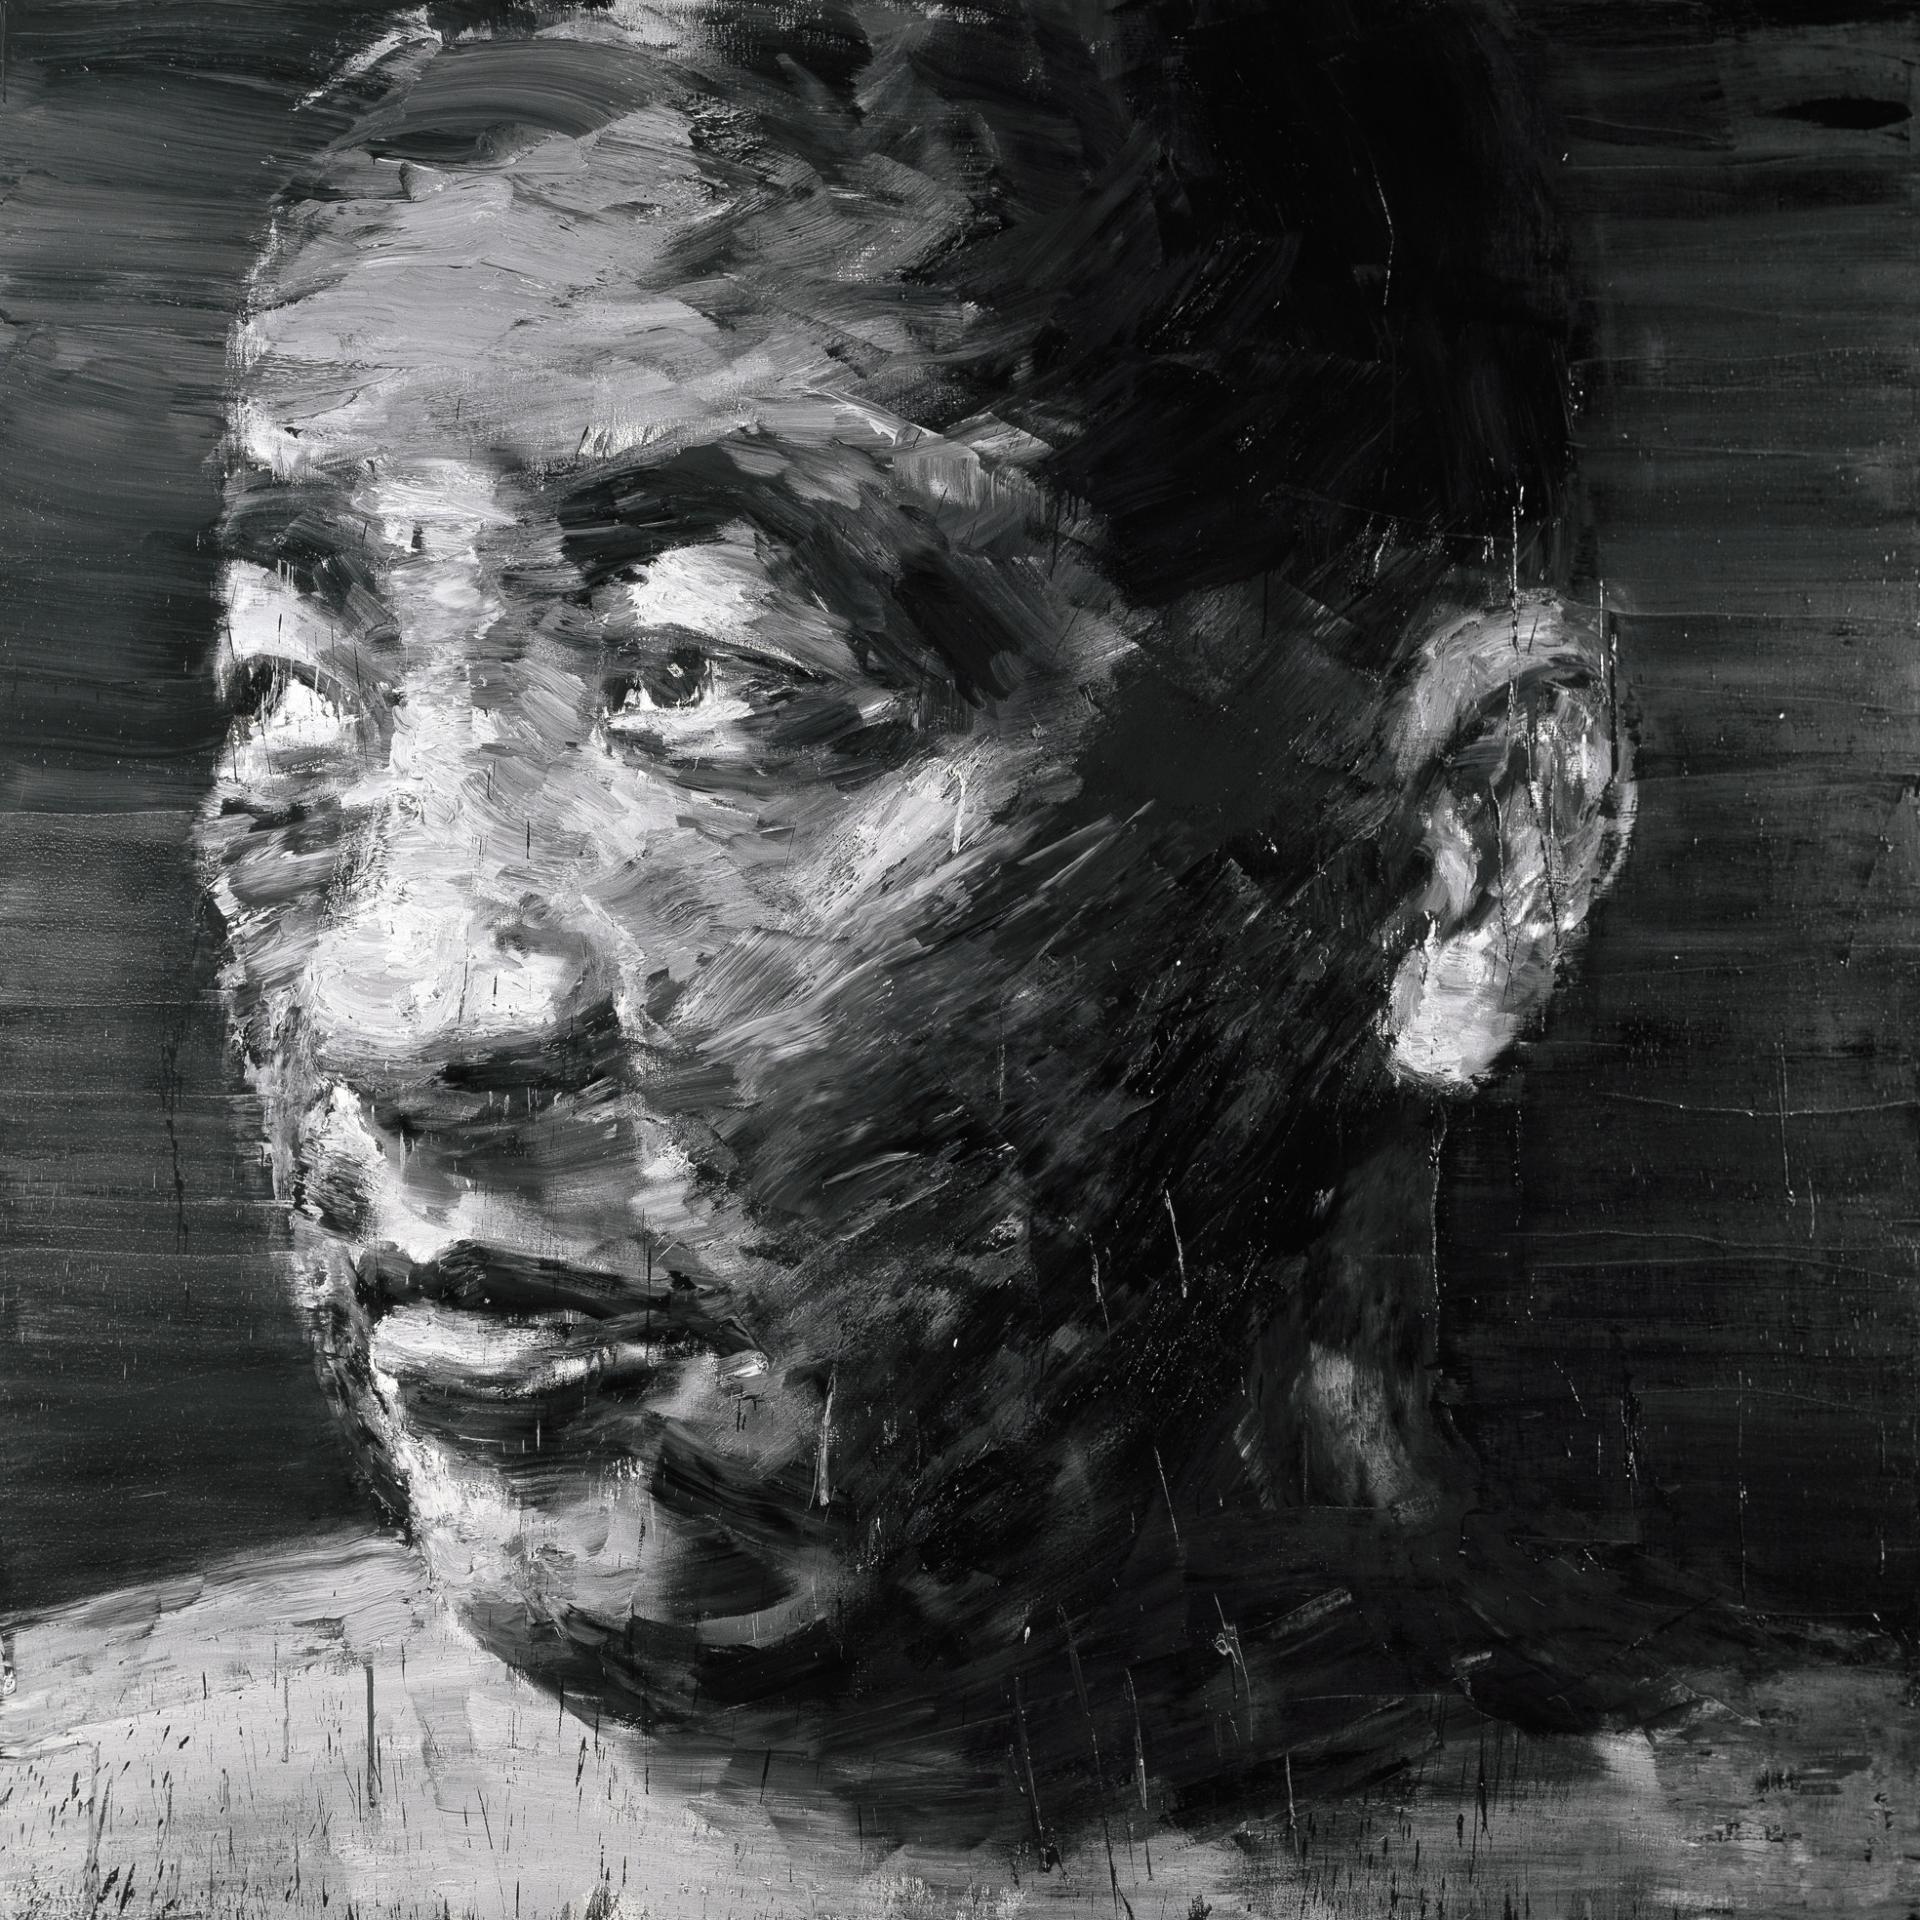 L'artiste franco-chinois Yan Pei-Ming, Musée Interlinden, Colmar